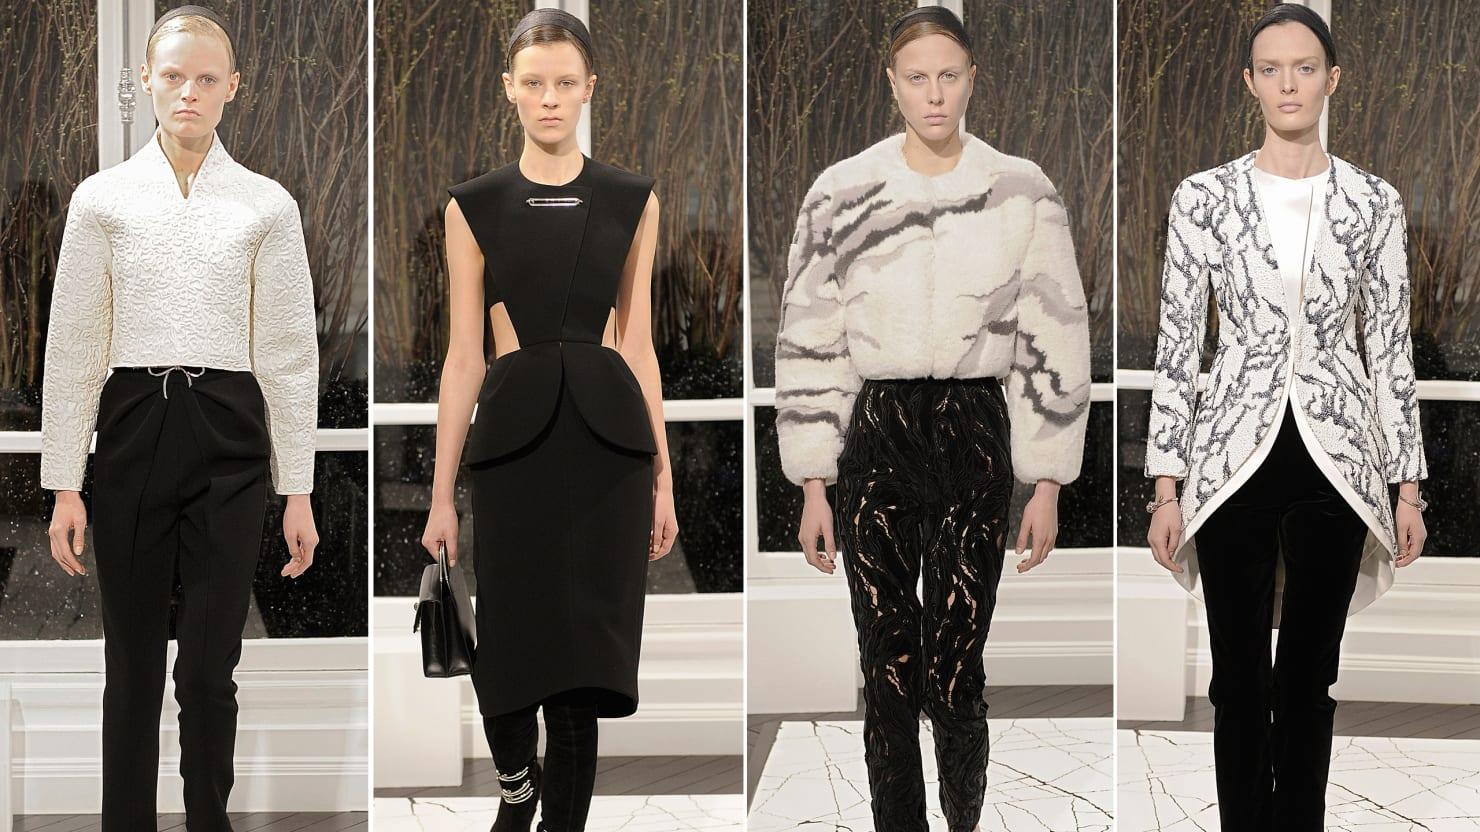 130228-balenciaga-paris-fashion_hw5igs Fashion Designer House K Y on fashion designer logos, fashion label logos with letters k and y, fashion house logos, fashion designer house key with label,